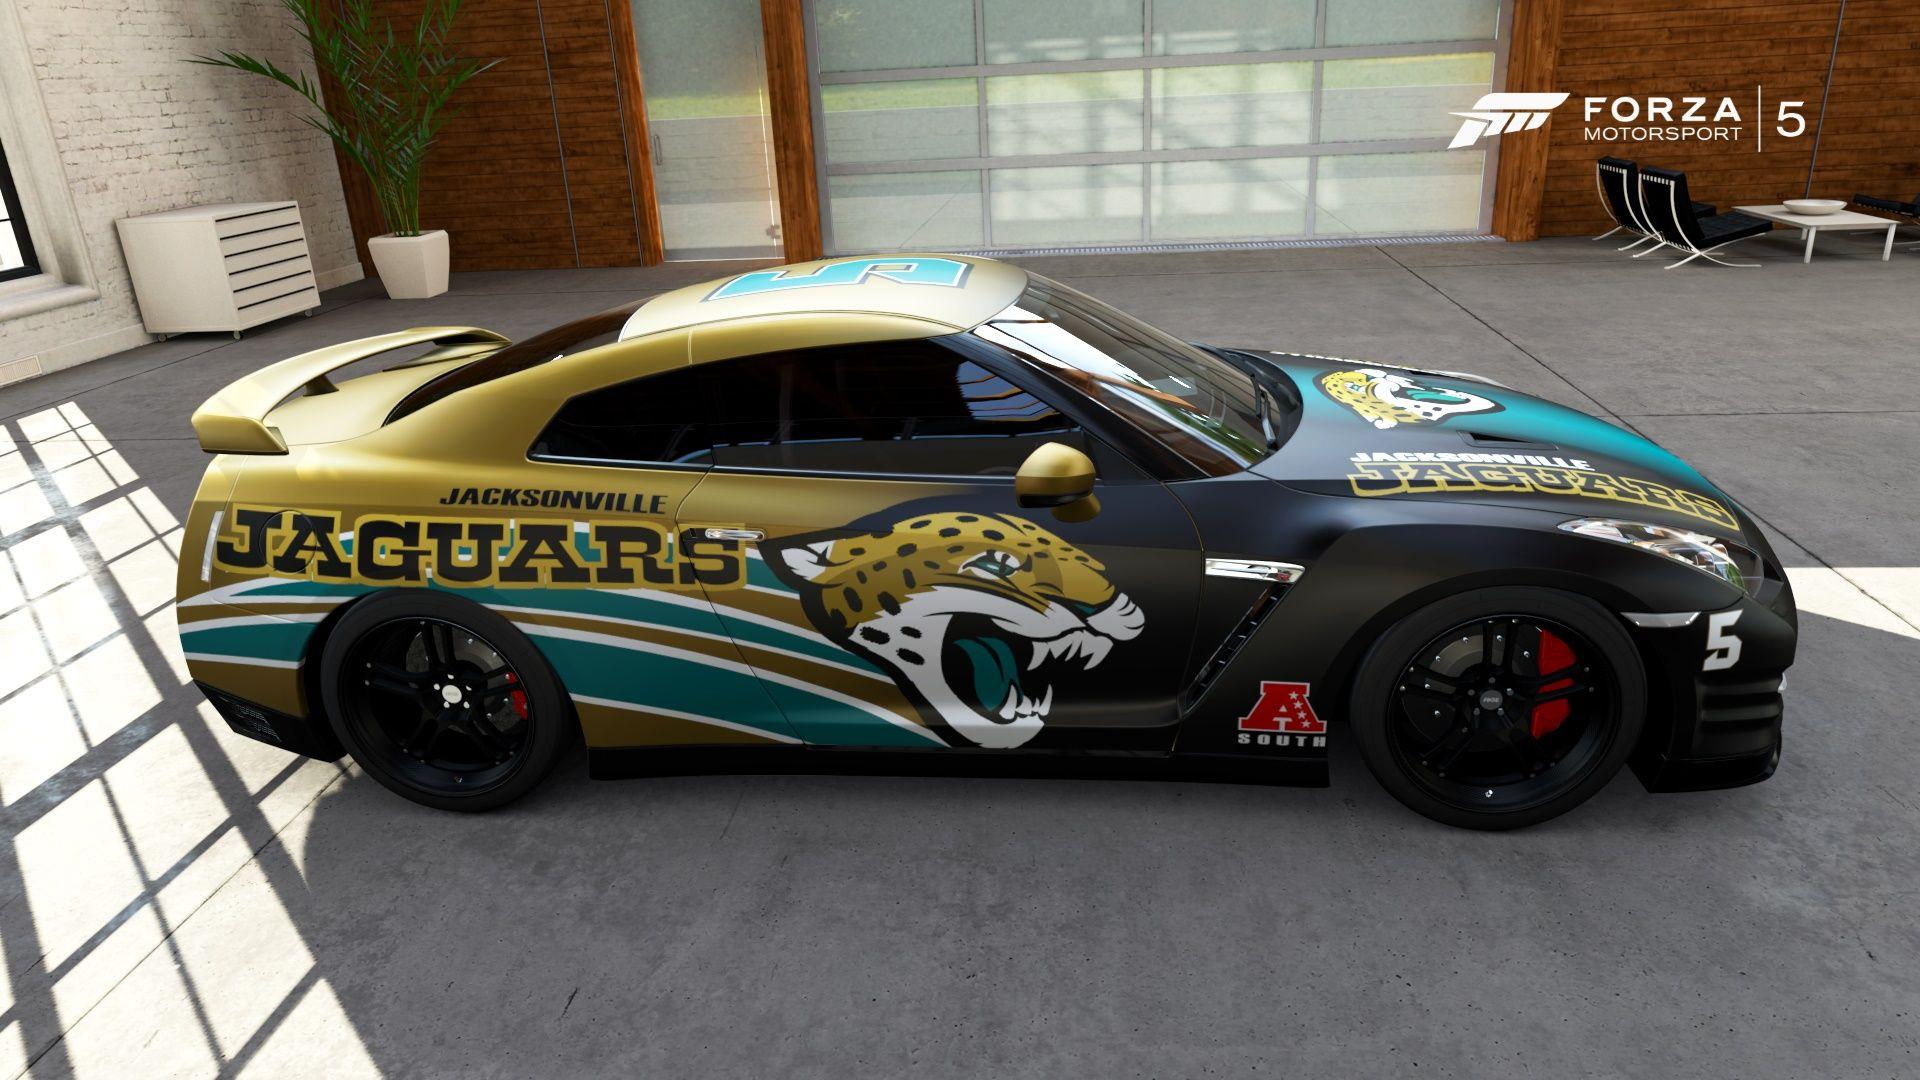 jaguars photos news premium road review s jaguar reviews driver xf photo test and car original official info